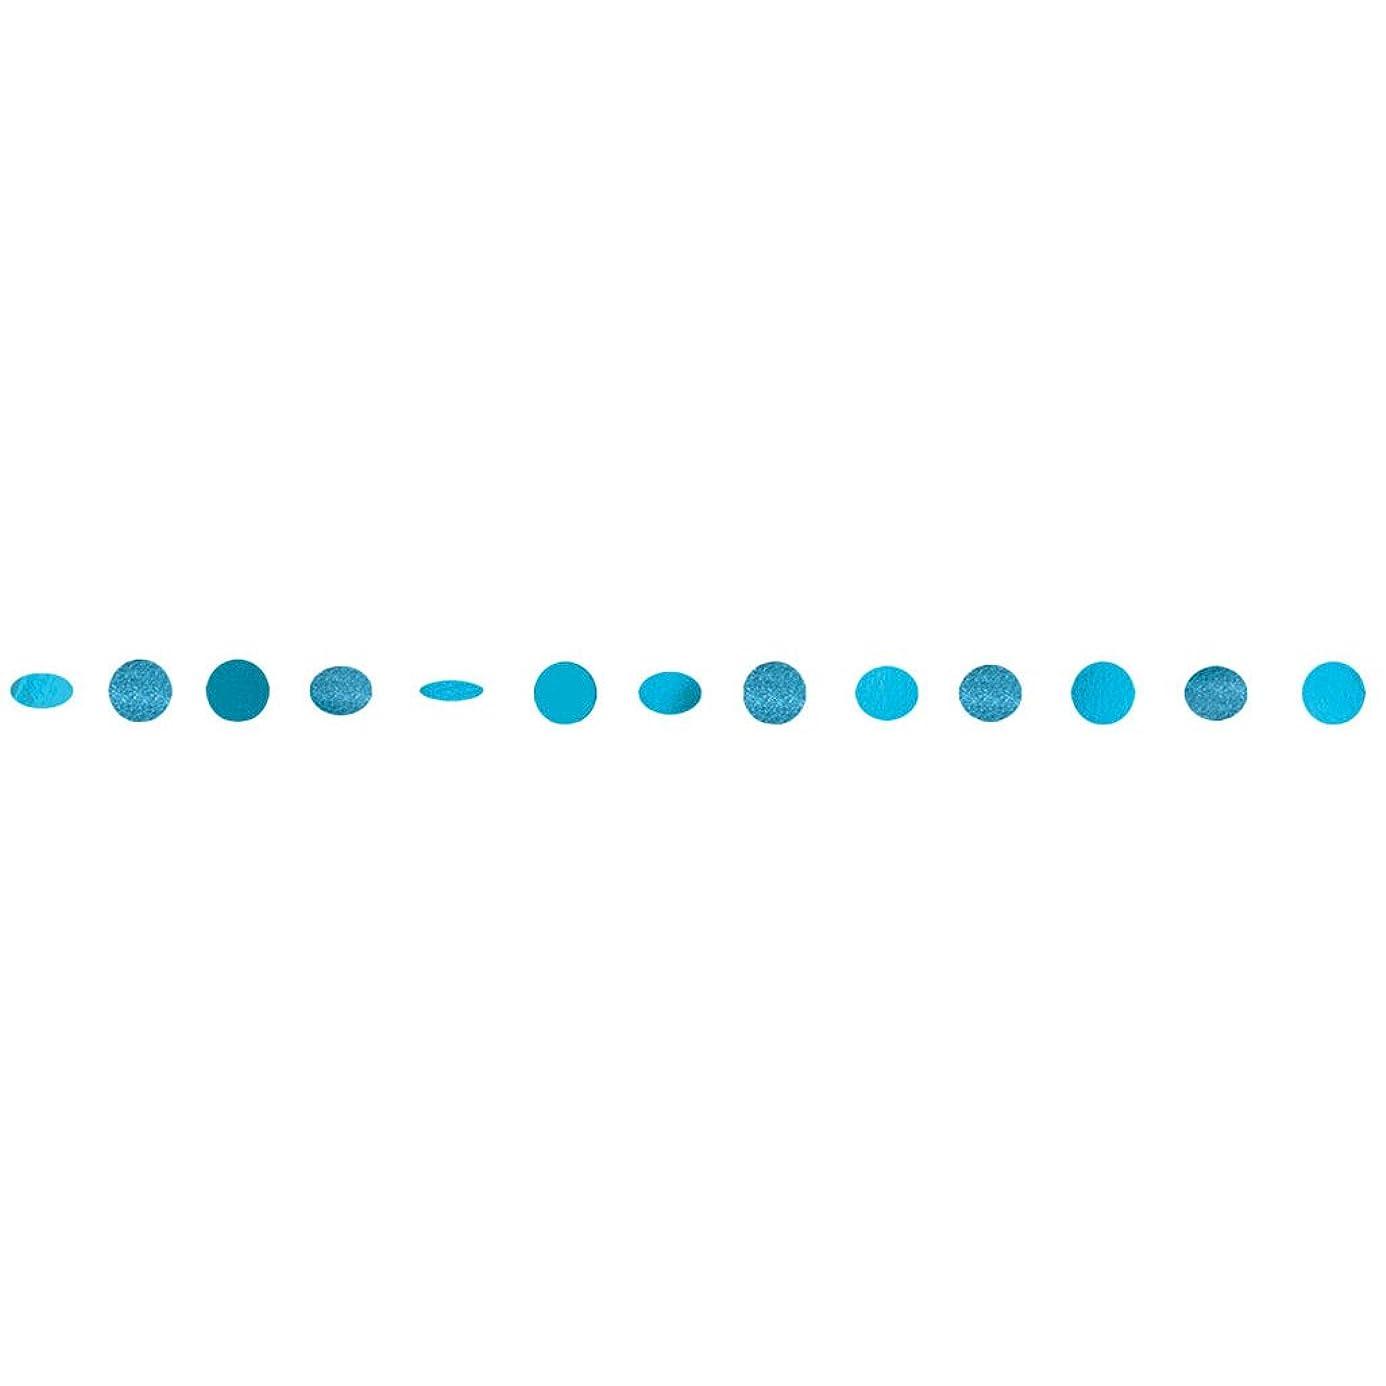 Amscan 672424.54 Round Glitter String, 7 feet, Caribbean Blue wwi1119954